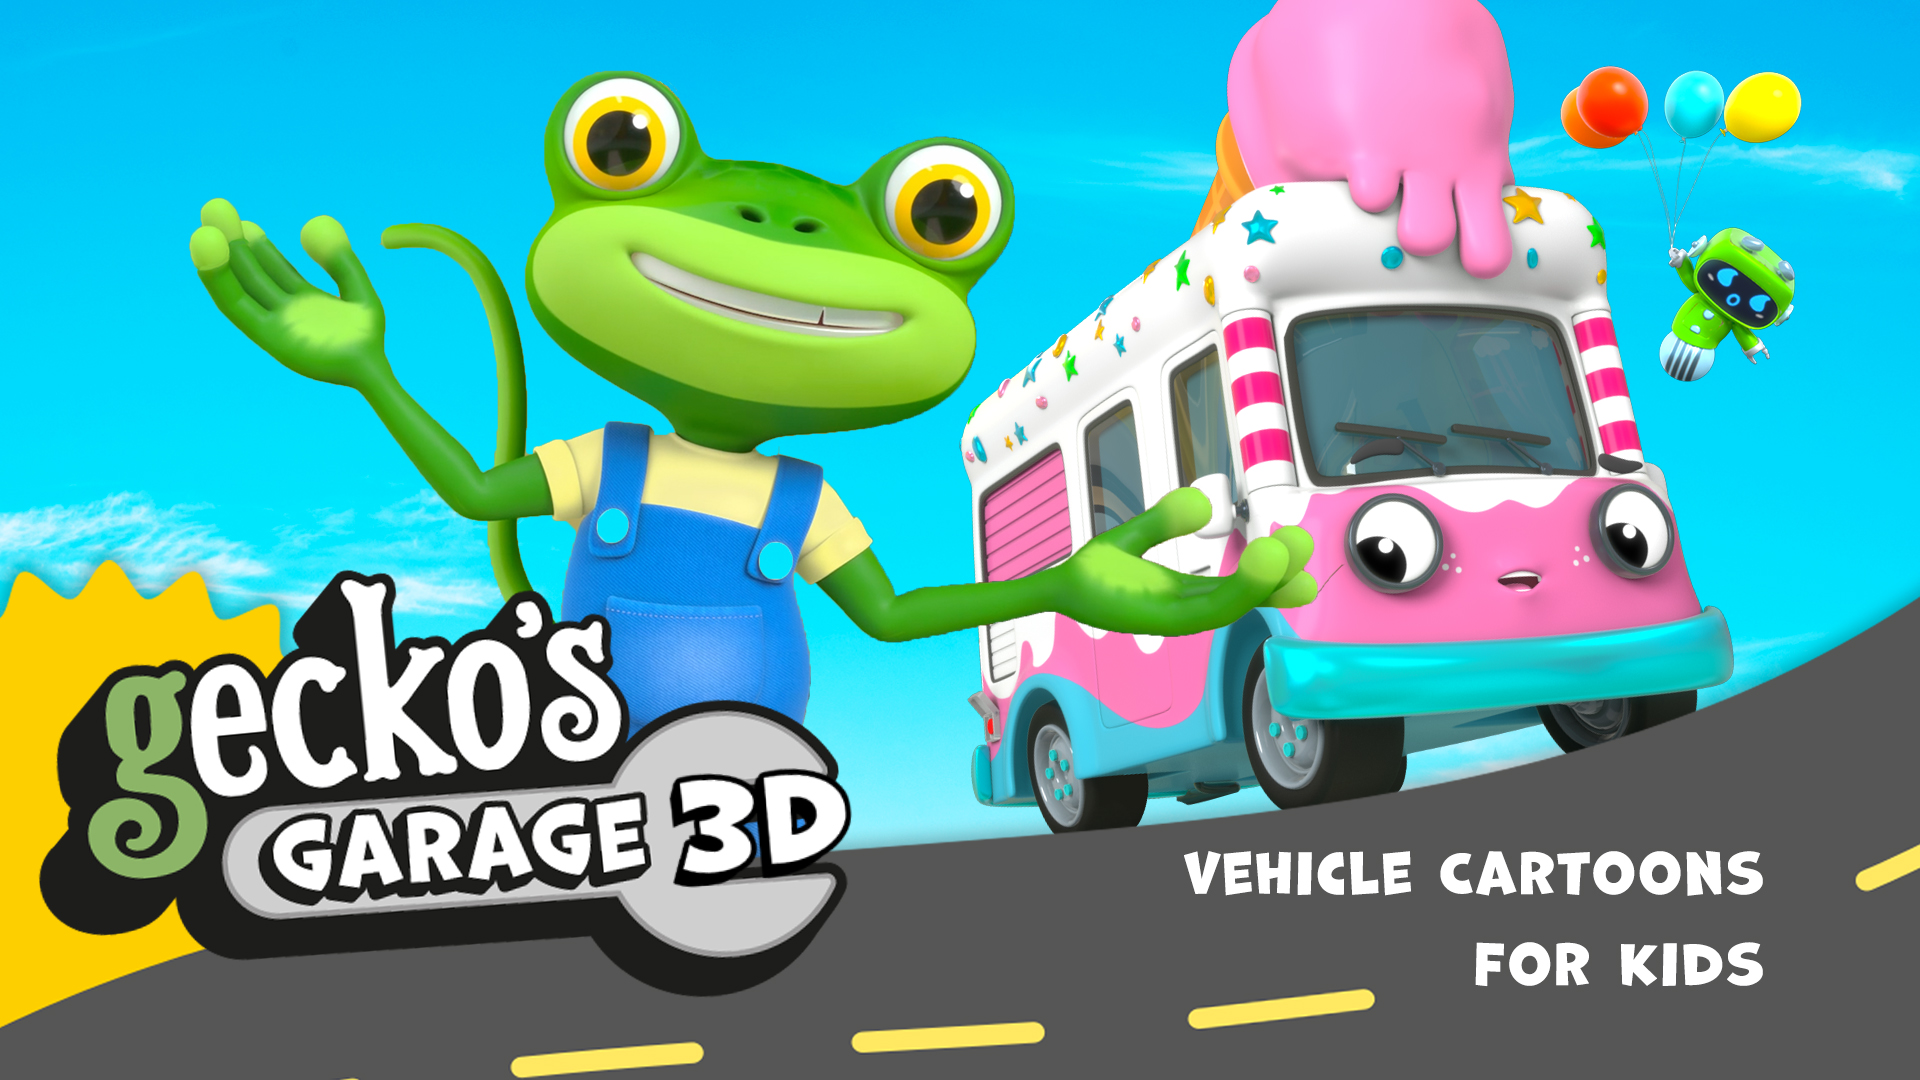 Gecko's Garage 3D - Vehicle Cartoons for Kids on Amazon Prime Video UK